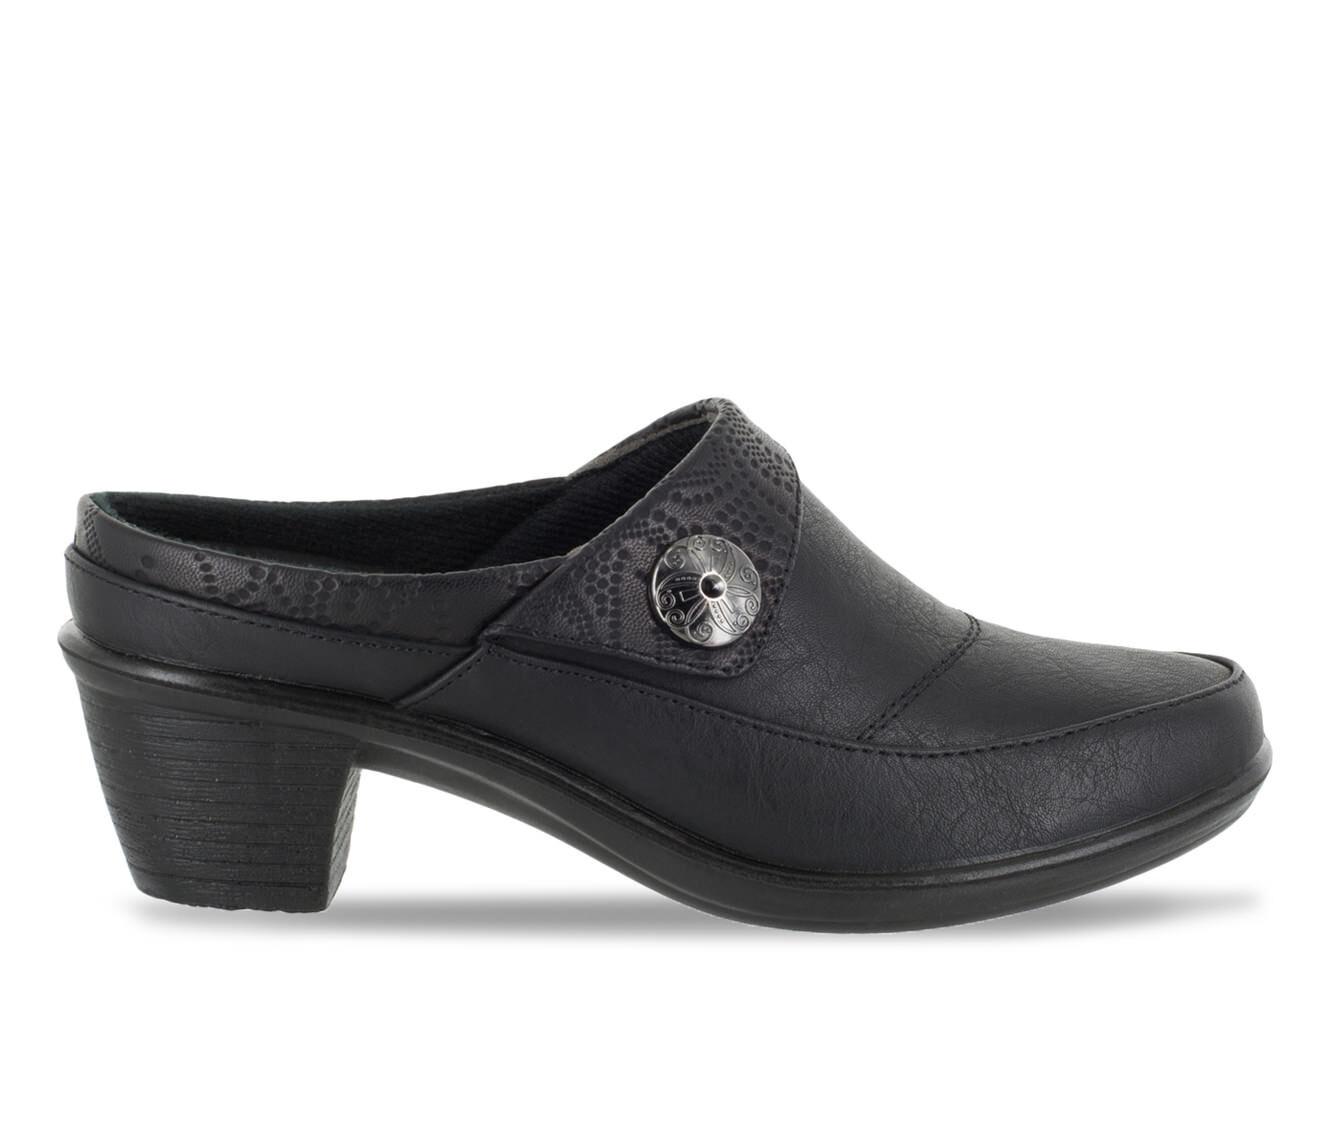 Get Cheap Women's Easy Street Journey Shoes Black/Embossed